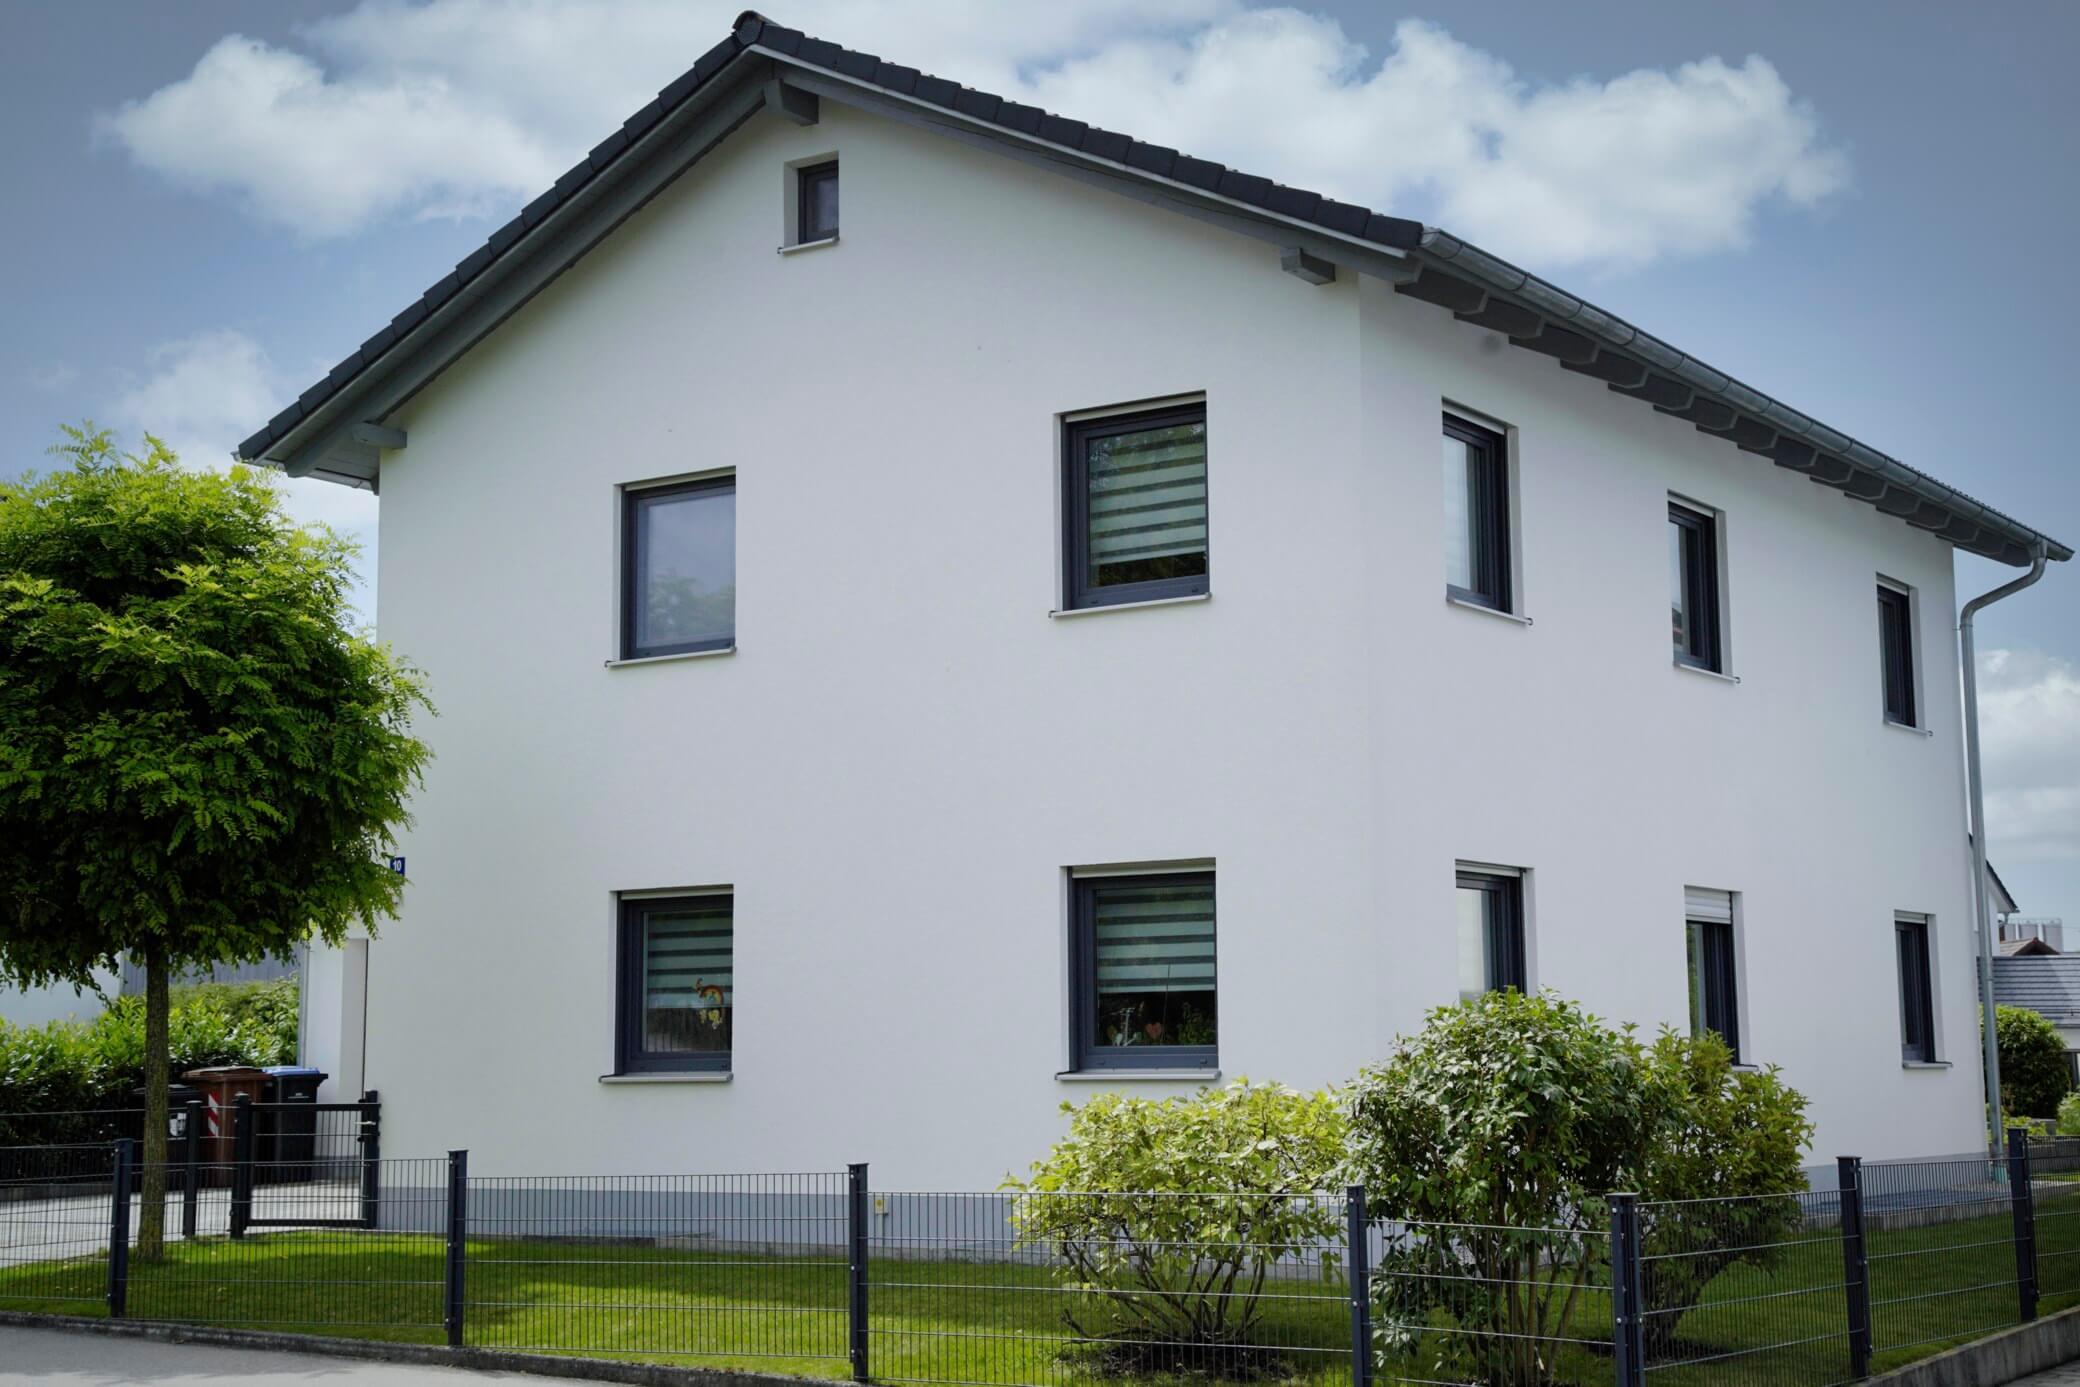 K&K Bau GmbH Massivhaus Referenzbild 32